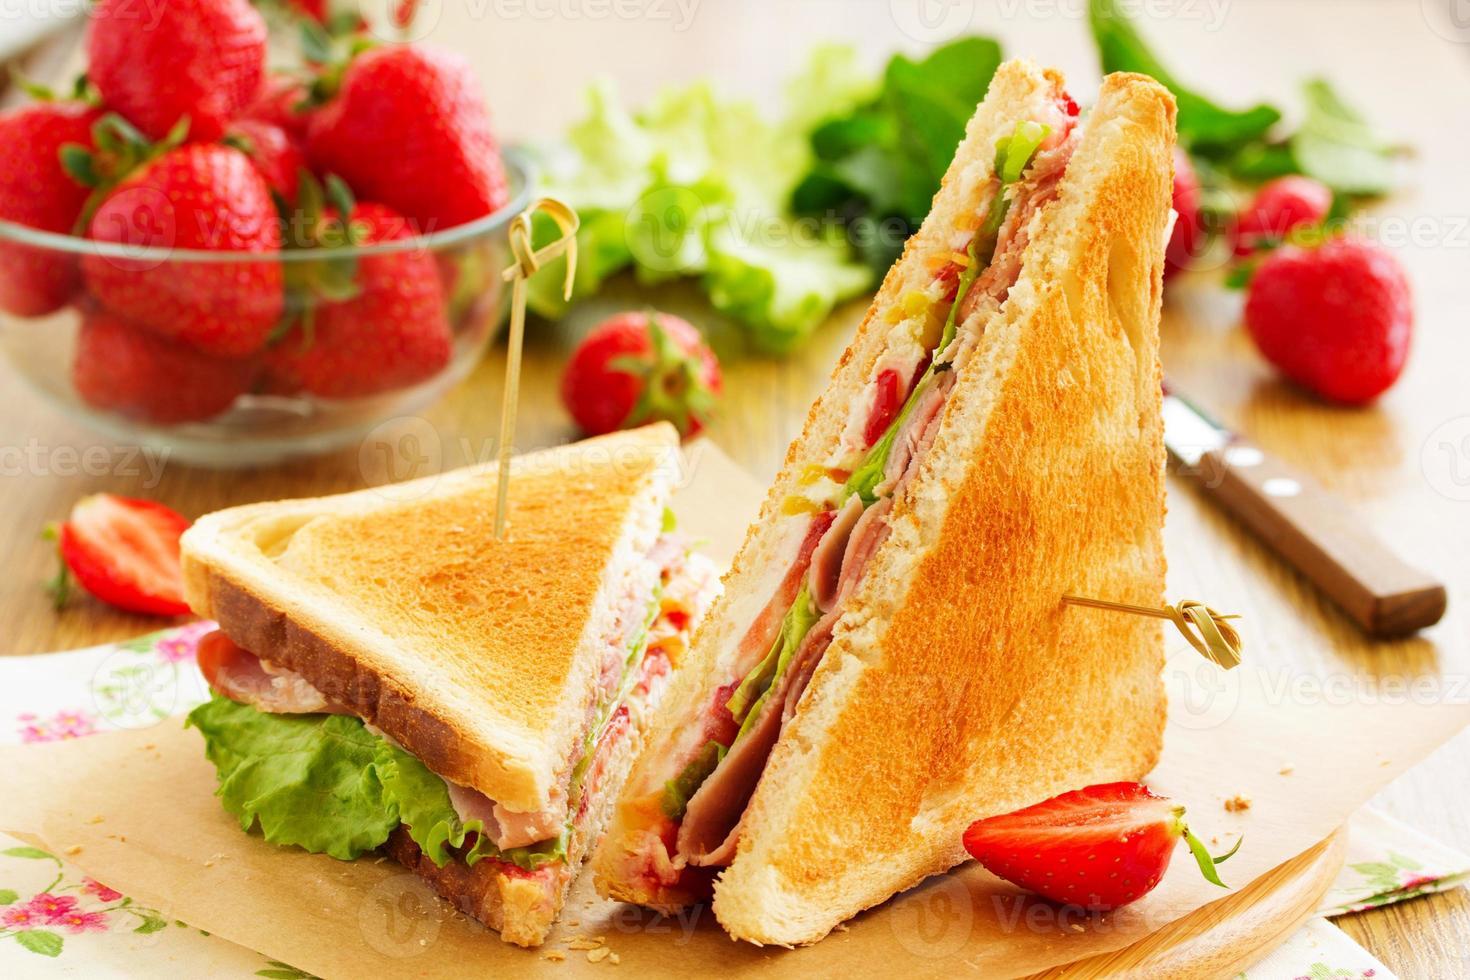 Dietary turkey sandwich and strawberry. photo